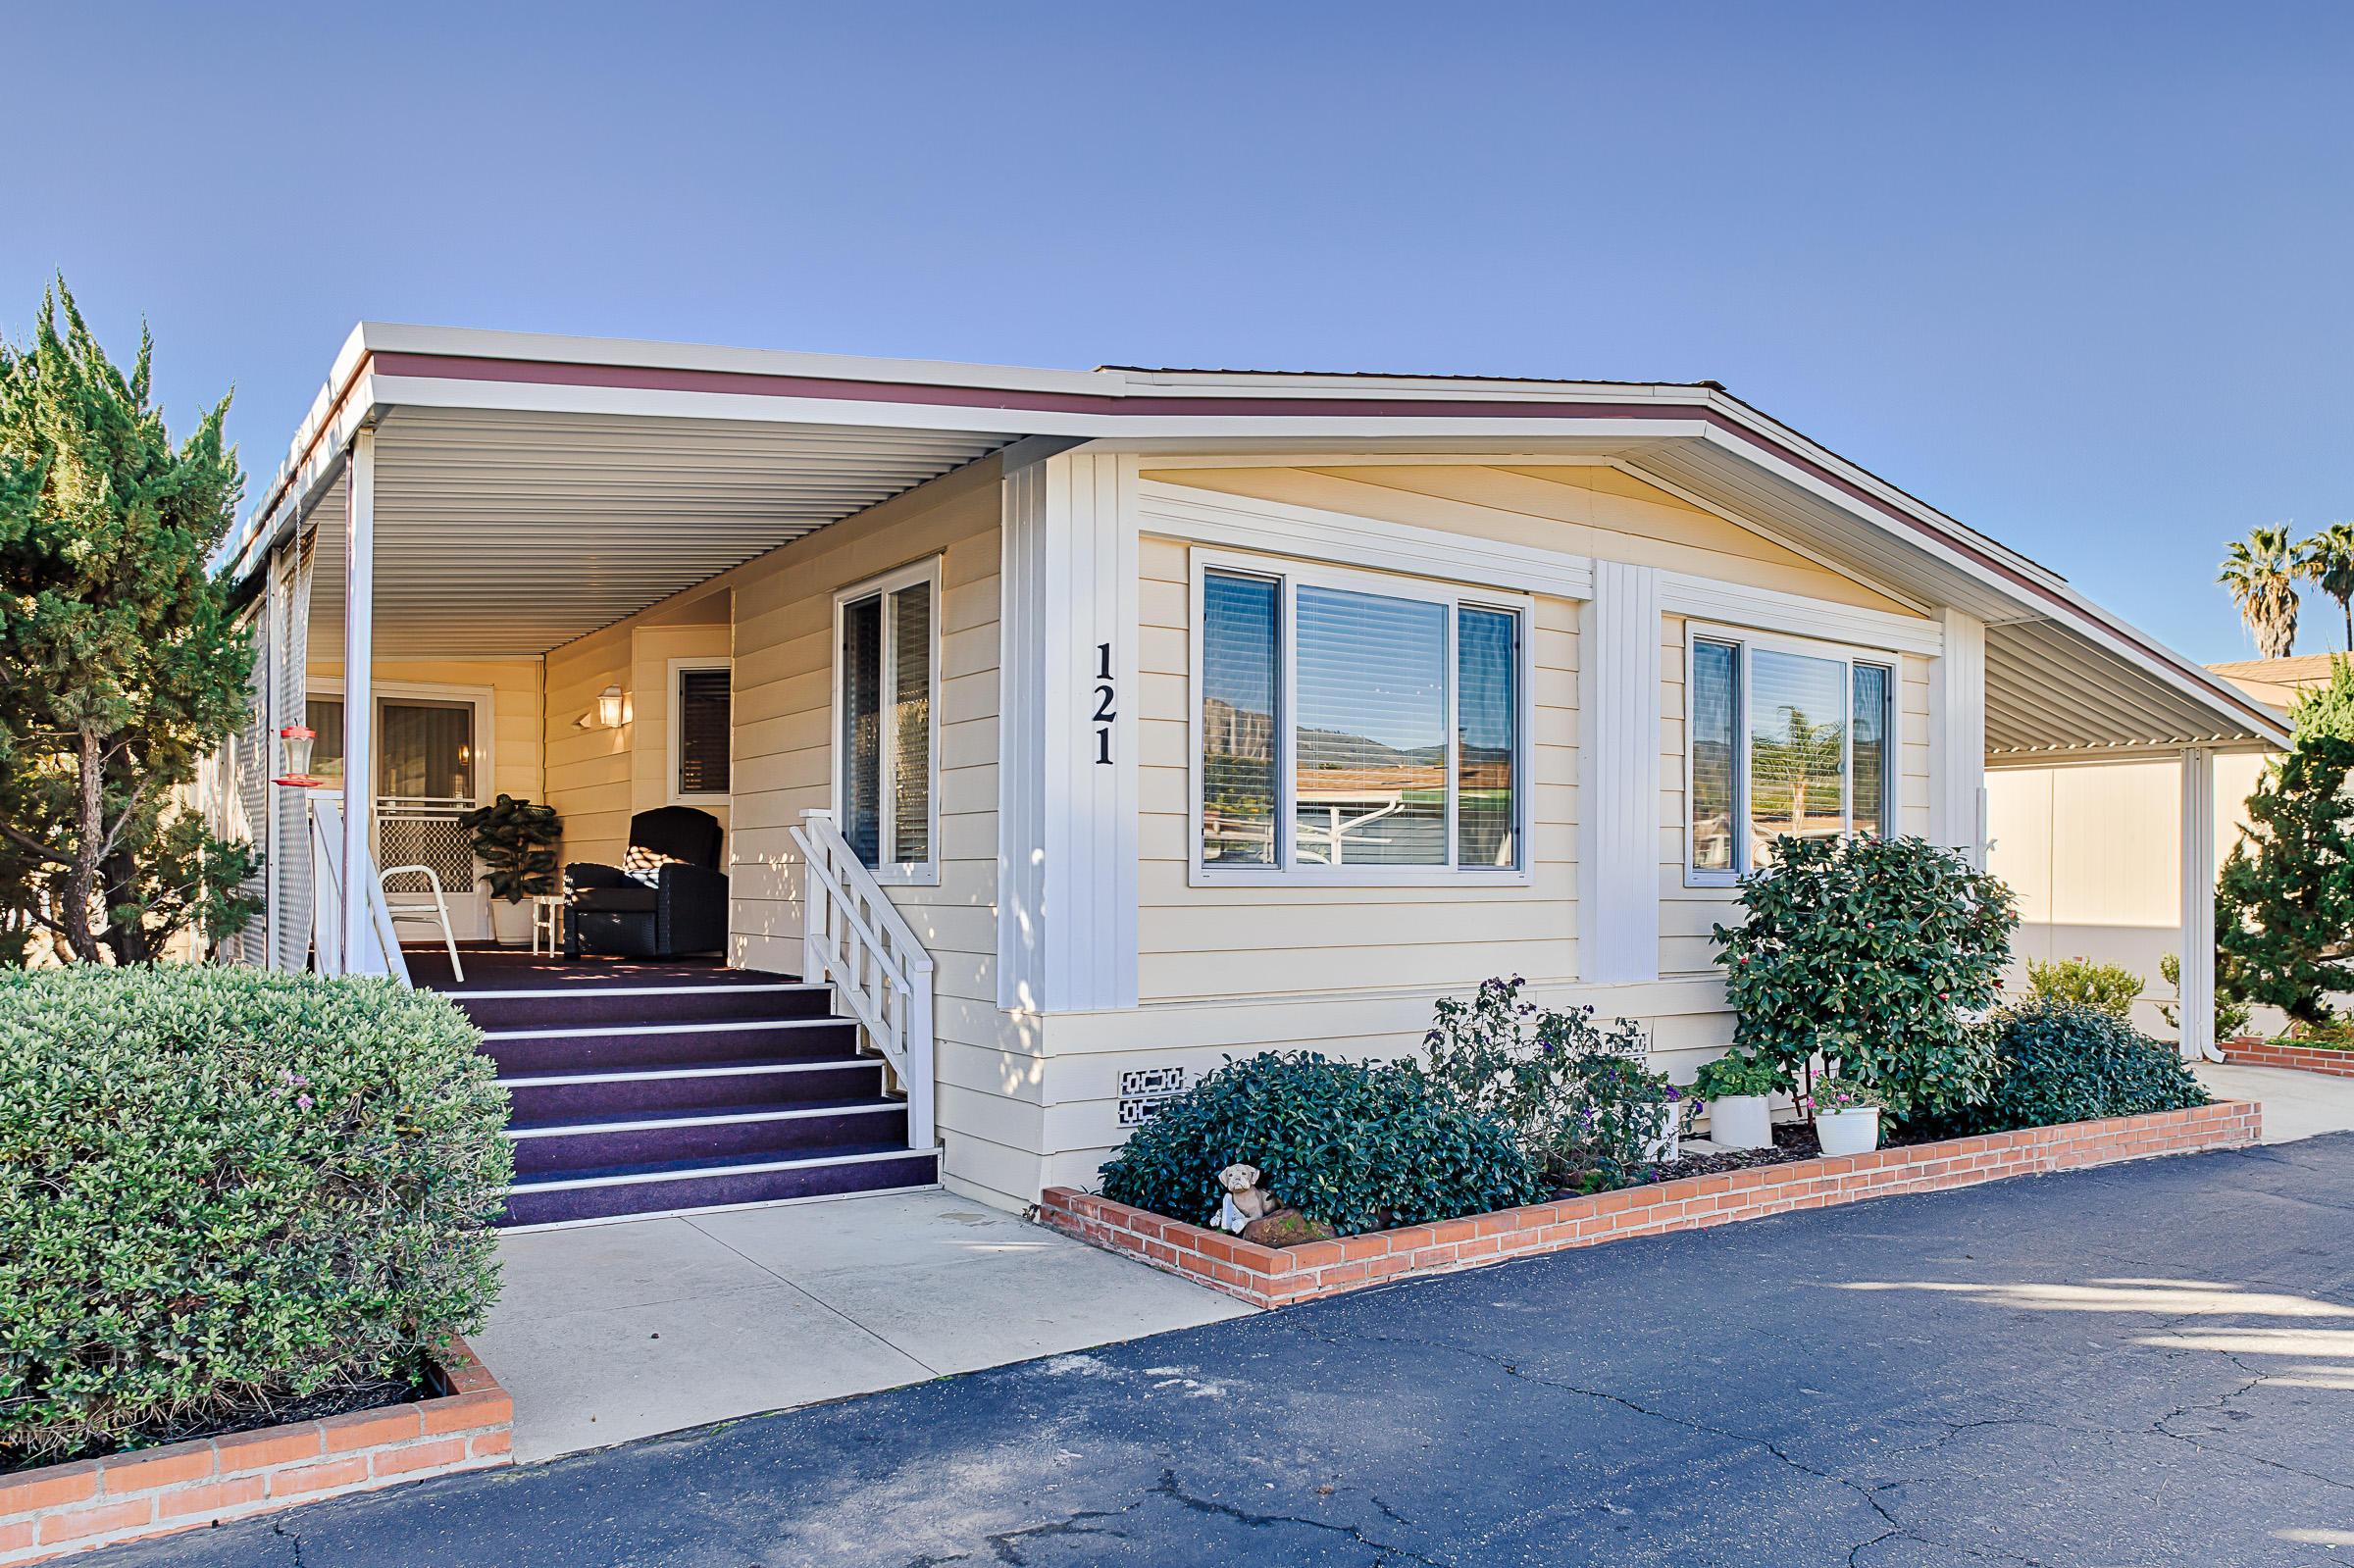 Property photo for 340 Old Mill Rd #Spc 121 Santa Barbara, California 93110 - 19-280